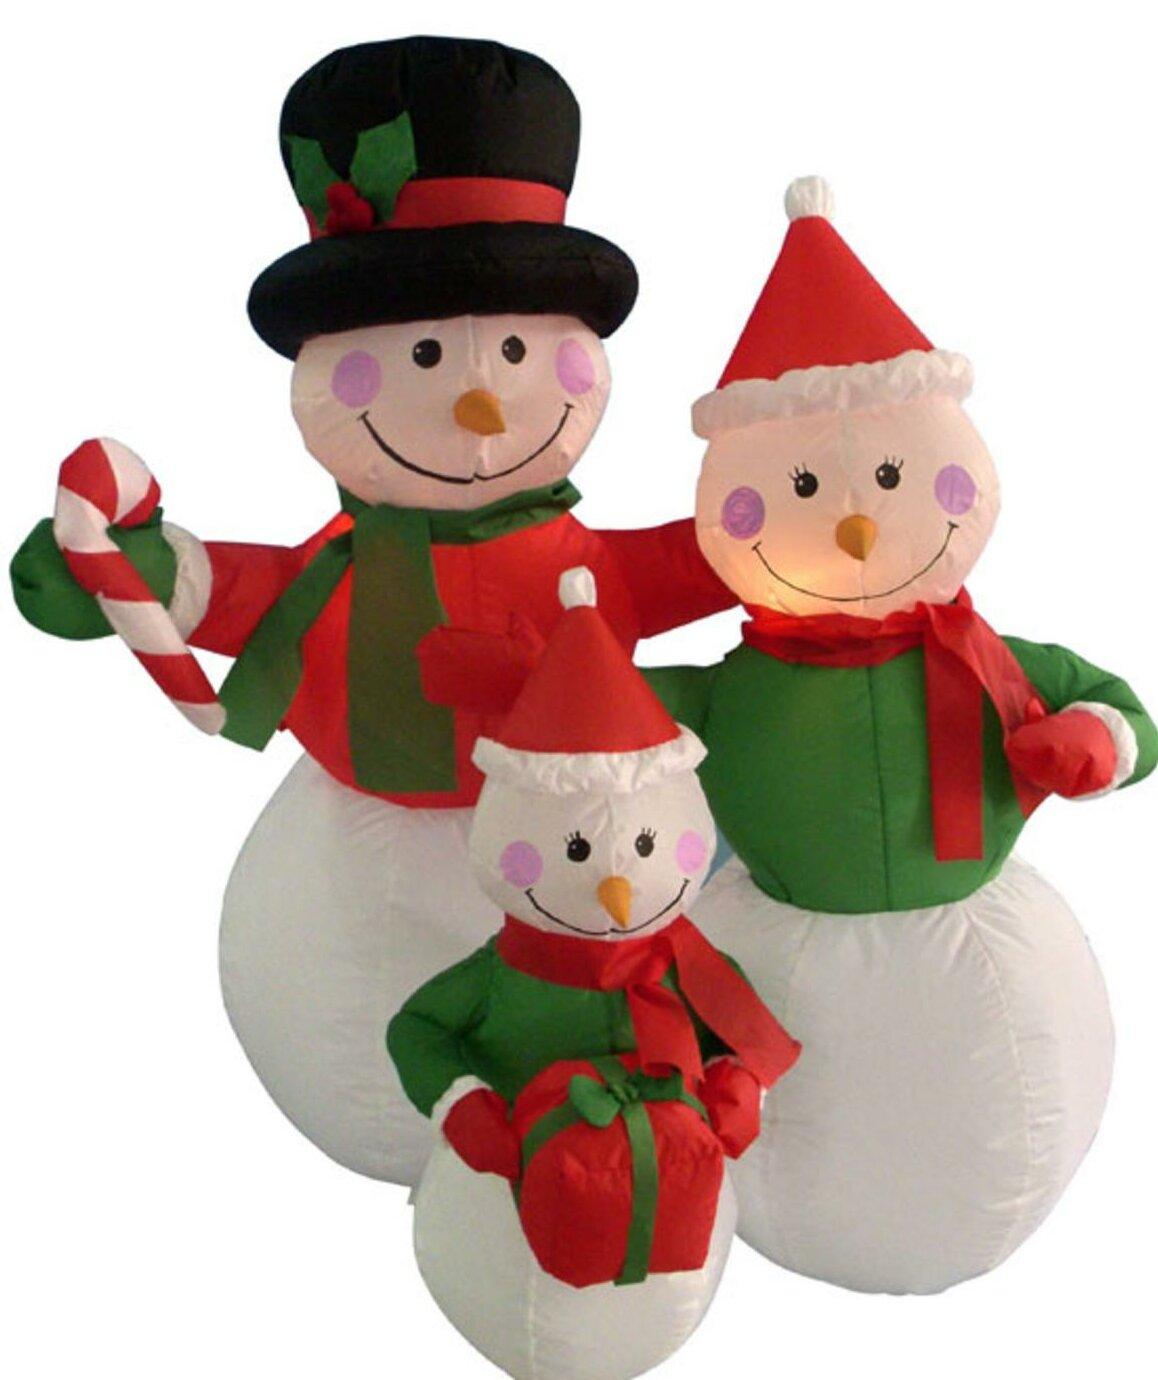 The Holiday Aisle Snowman Family Lighted Christmas Inflatable Wayfair